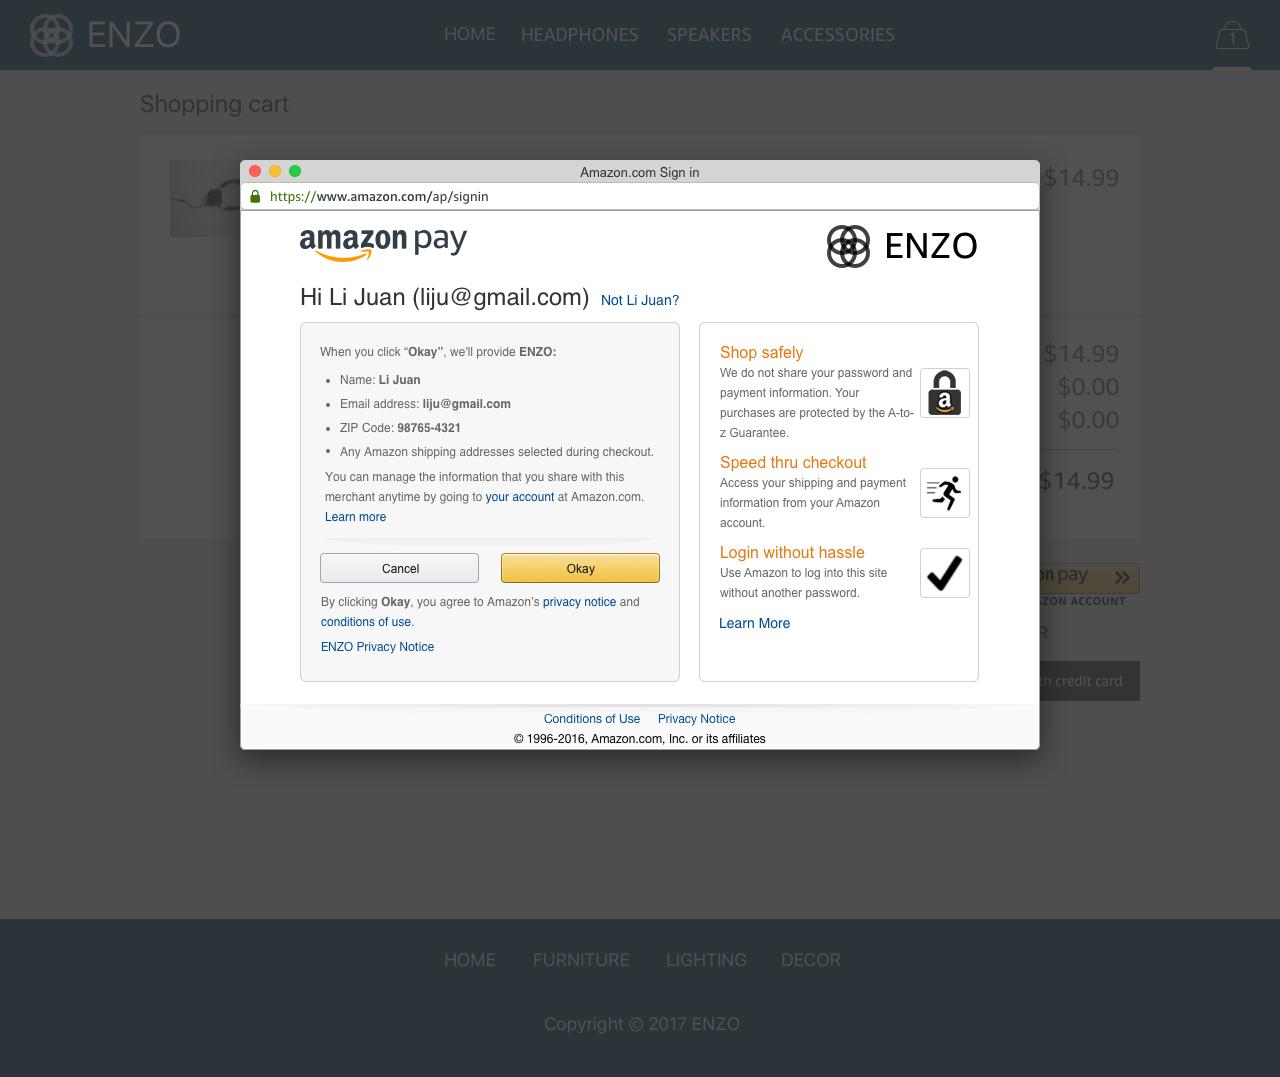 Amazon Pay Demo - #4 - Consent